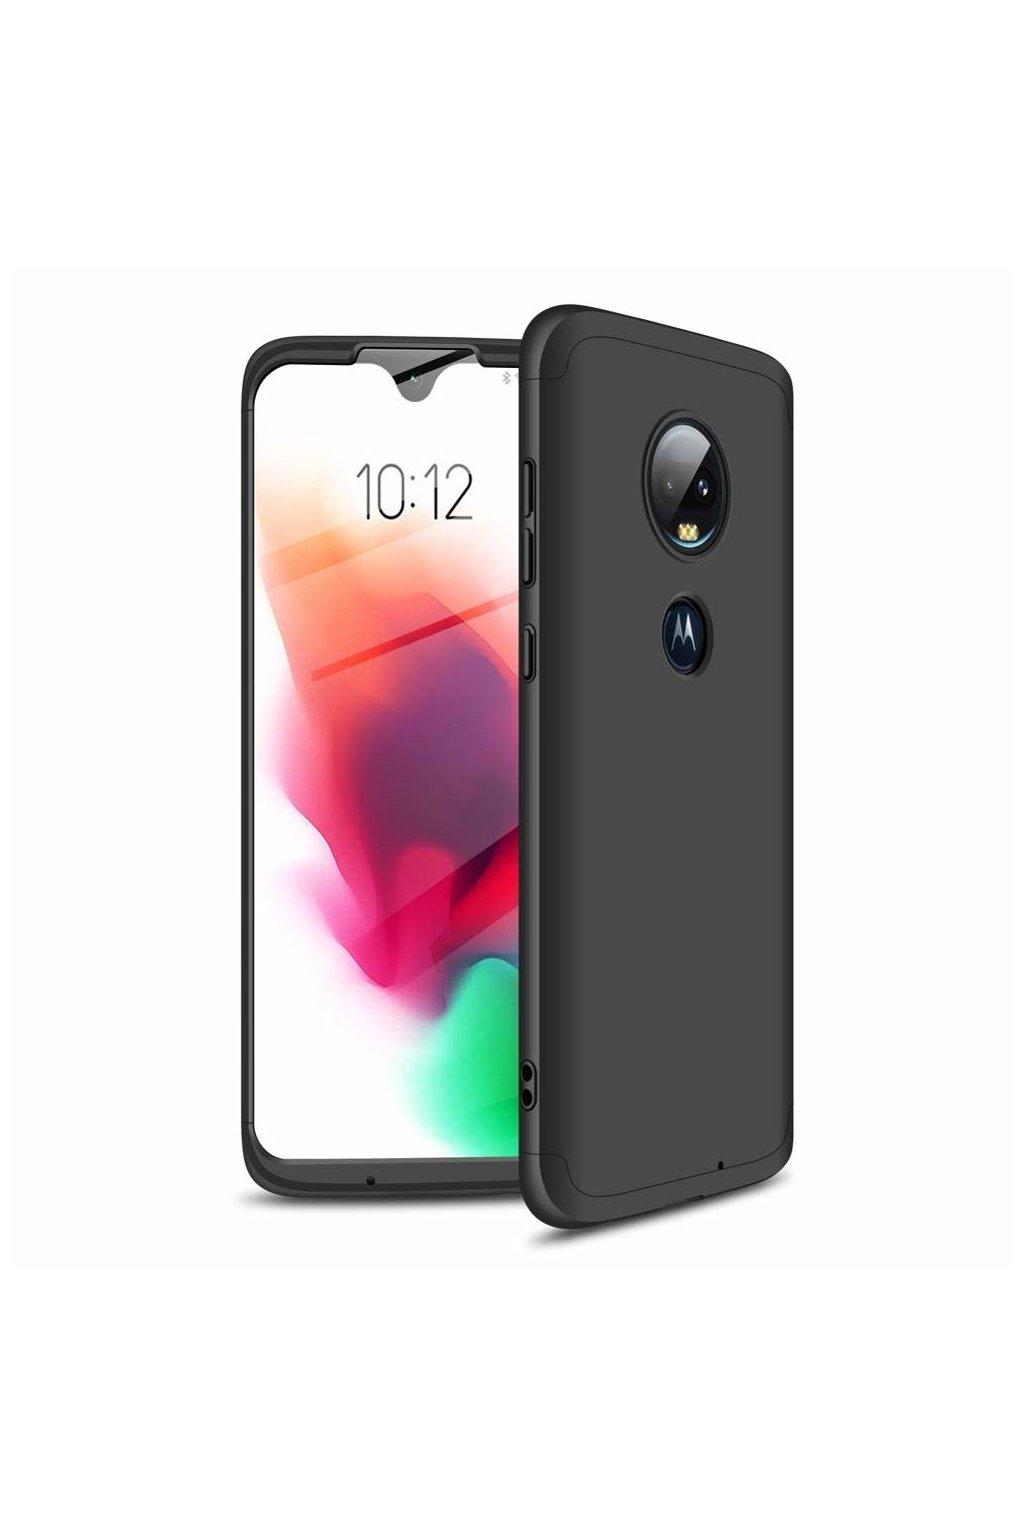 eng pl GKK 360 Protection Case Front and Back Case Full Body Cover Motorola Moto G7 black 46546 1